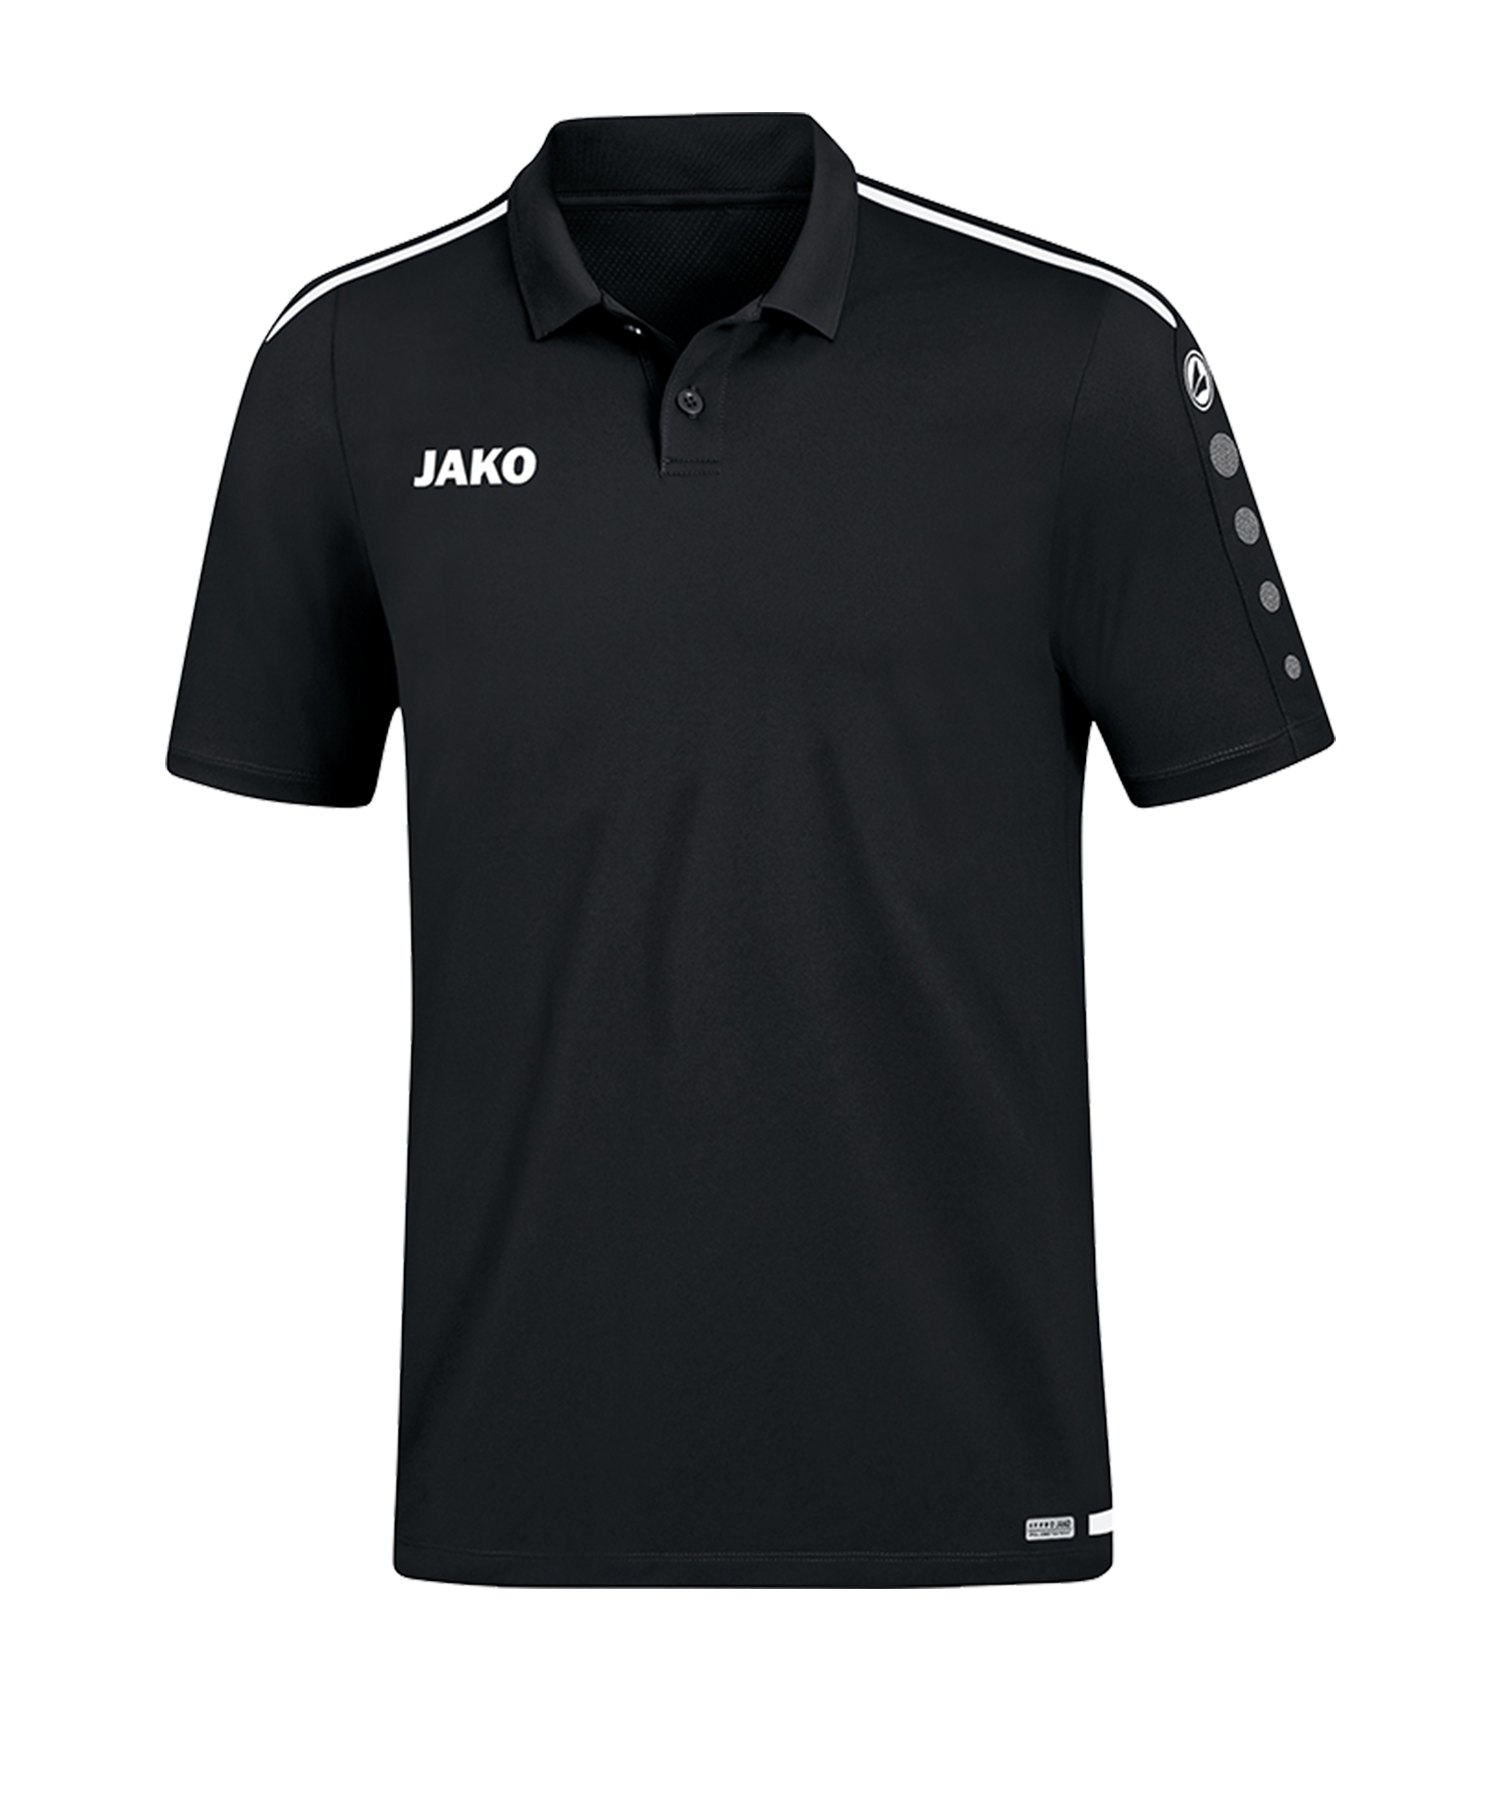 Jako Striker 2.0 Poloshirt Schwarz Weiss F08 - Schwarz